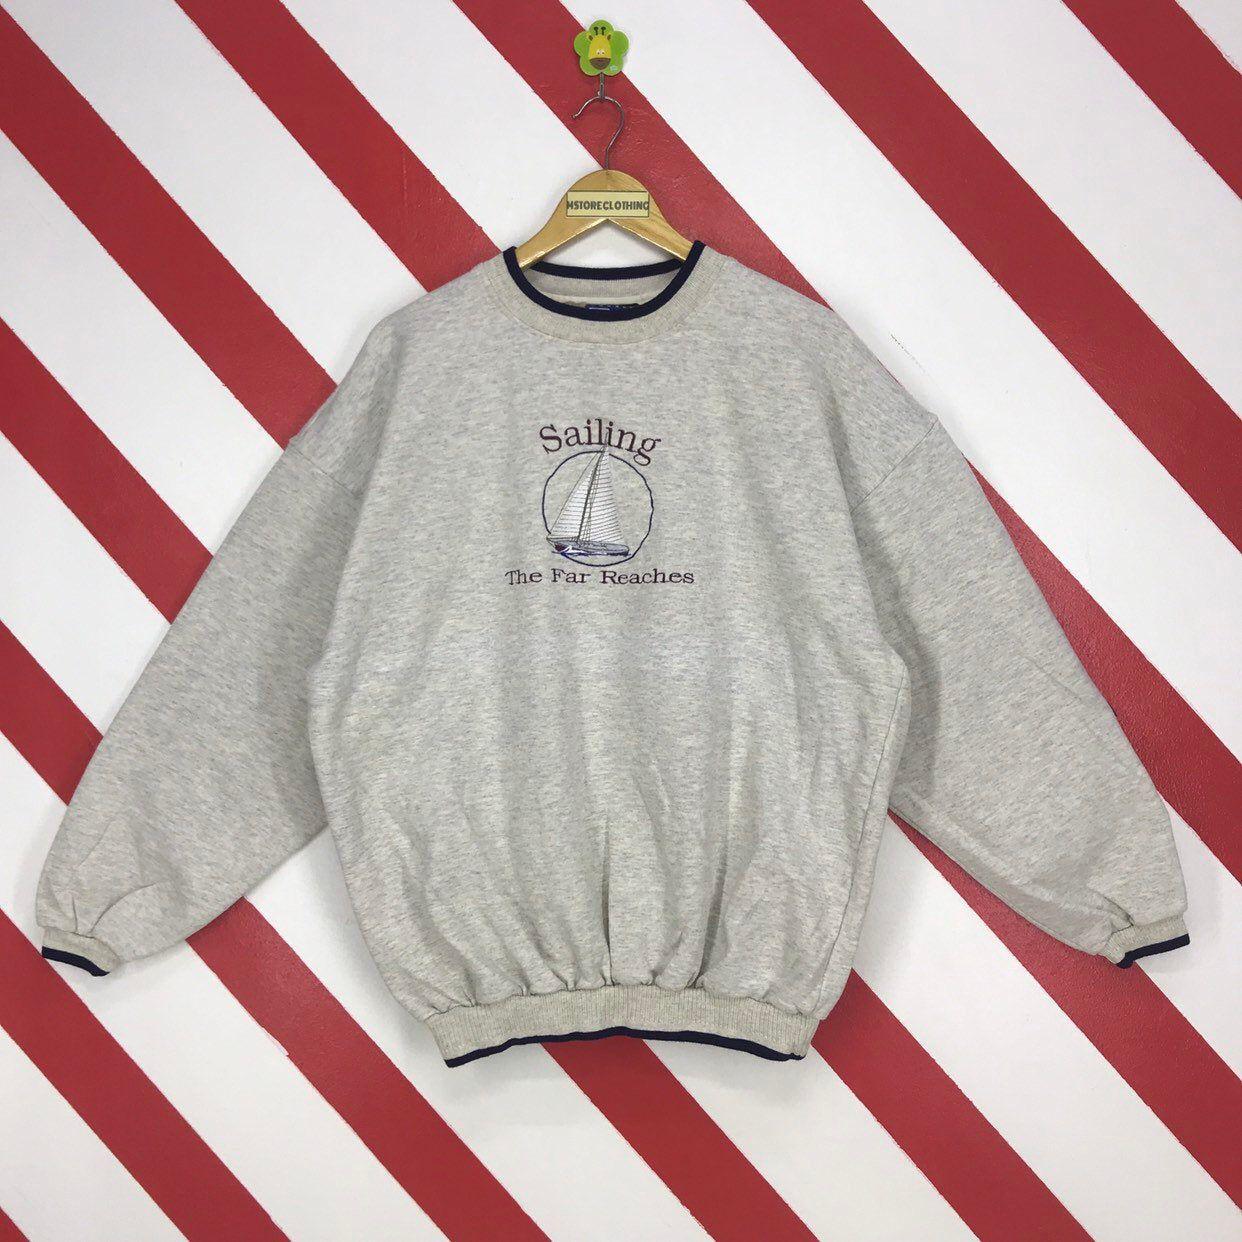 Vintage Sweater Grey Jumper Retro Jumper 90s Jumper Knitted Jumper Boho Jumper Vintage Jumper Winter Jumper